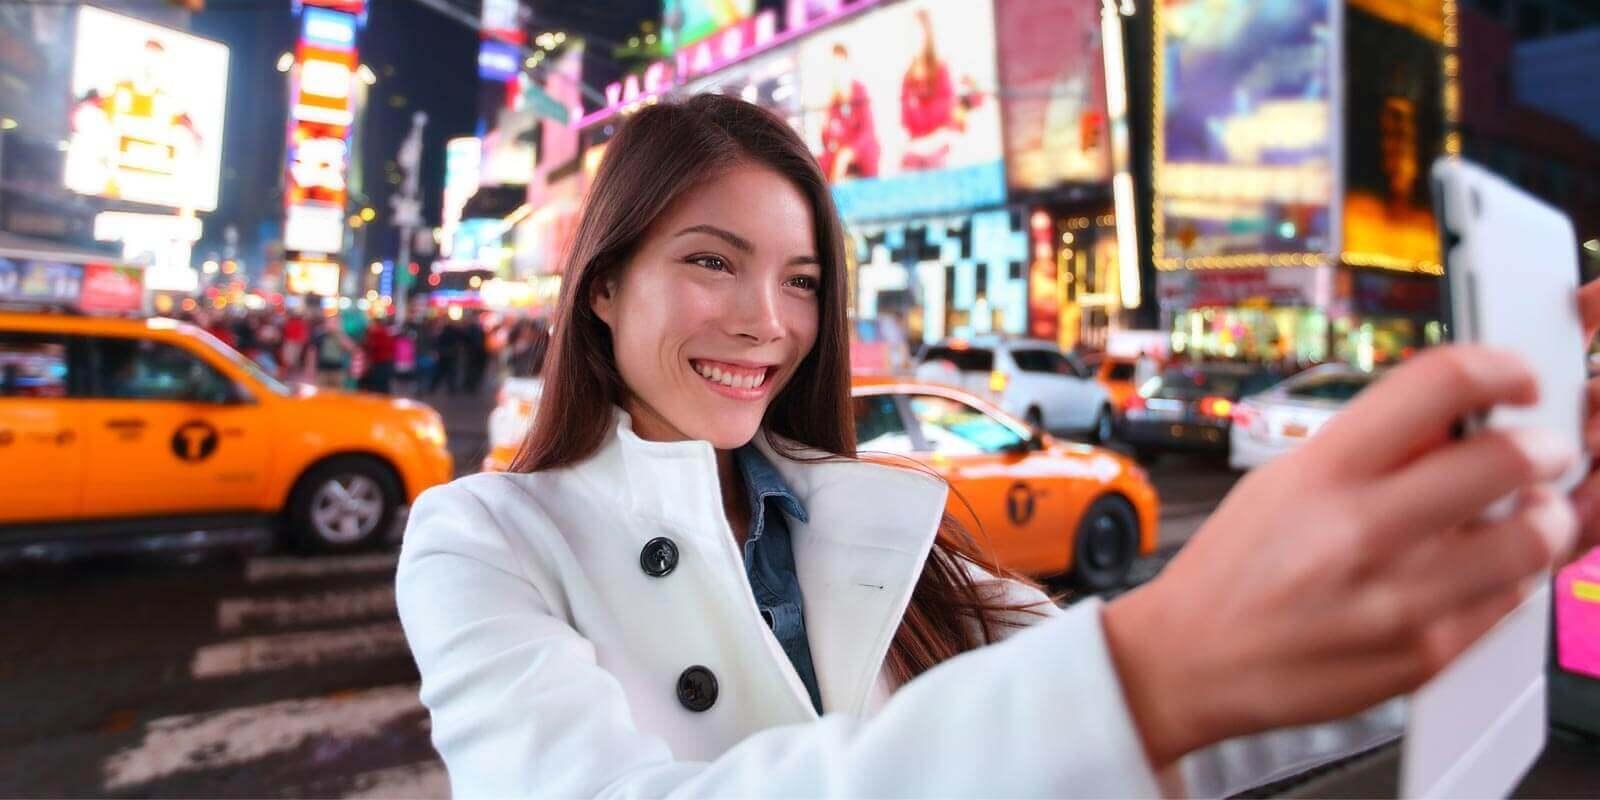 ragazza selfie new york city manhattan a times square